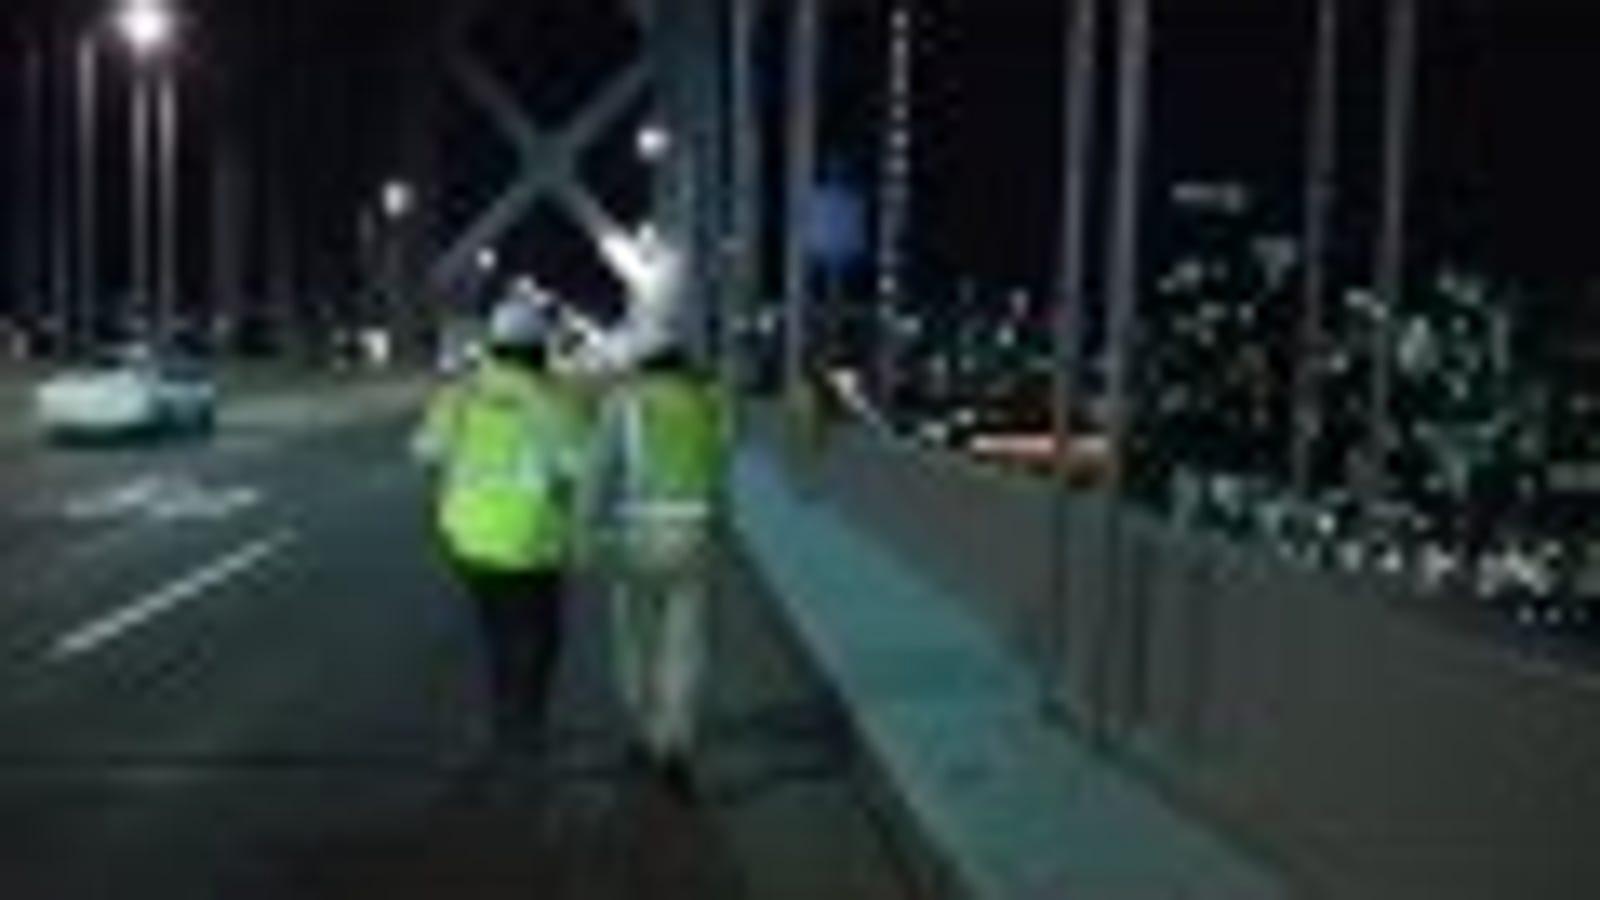 The Bay Bridge's Crazy Light Show Has an Illuminating Documentary